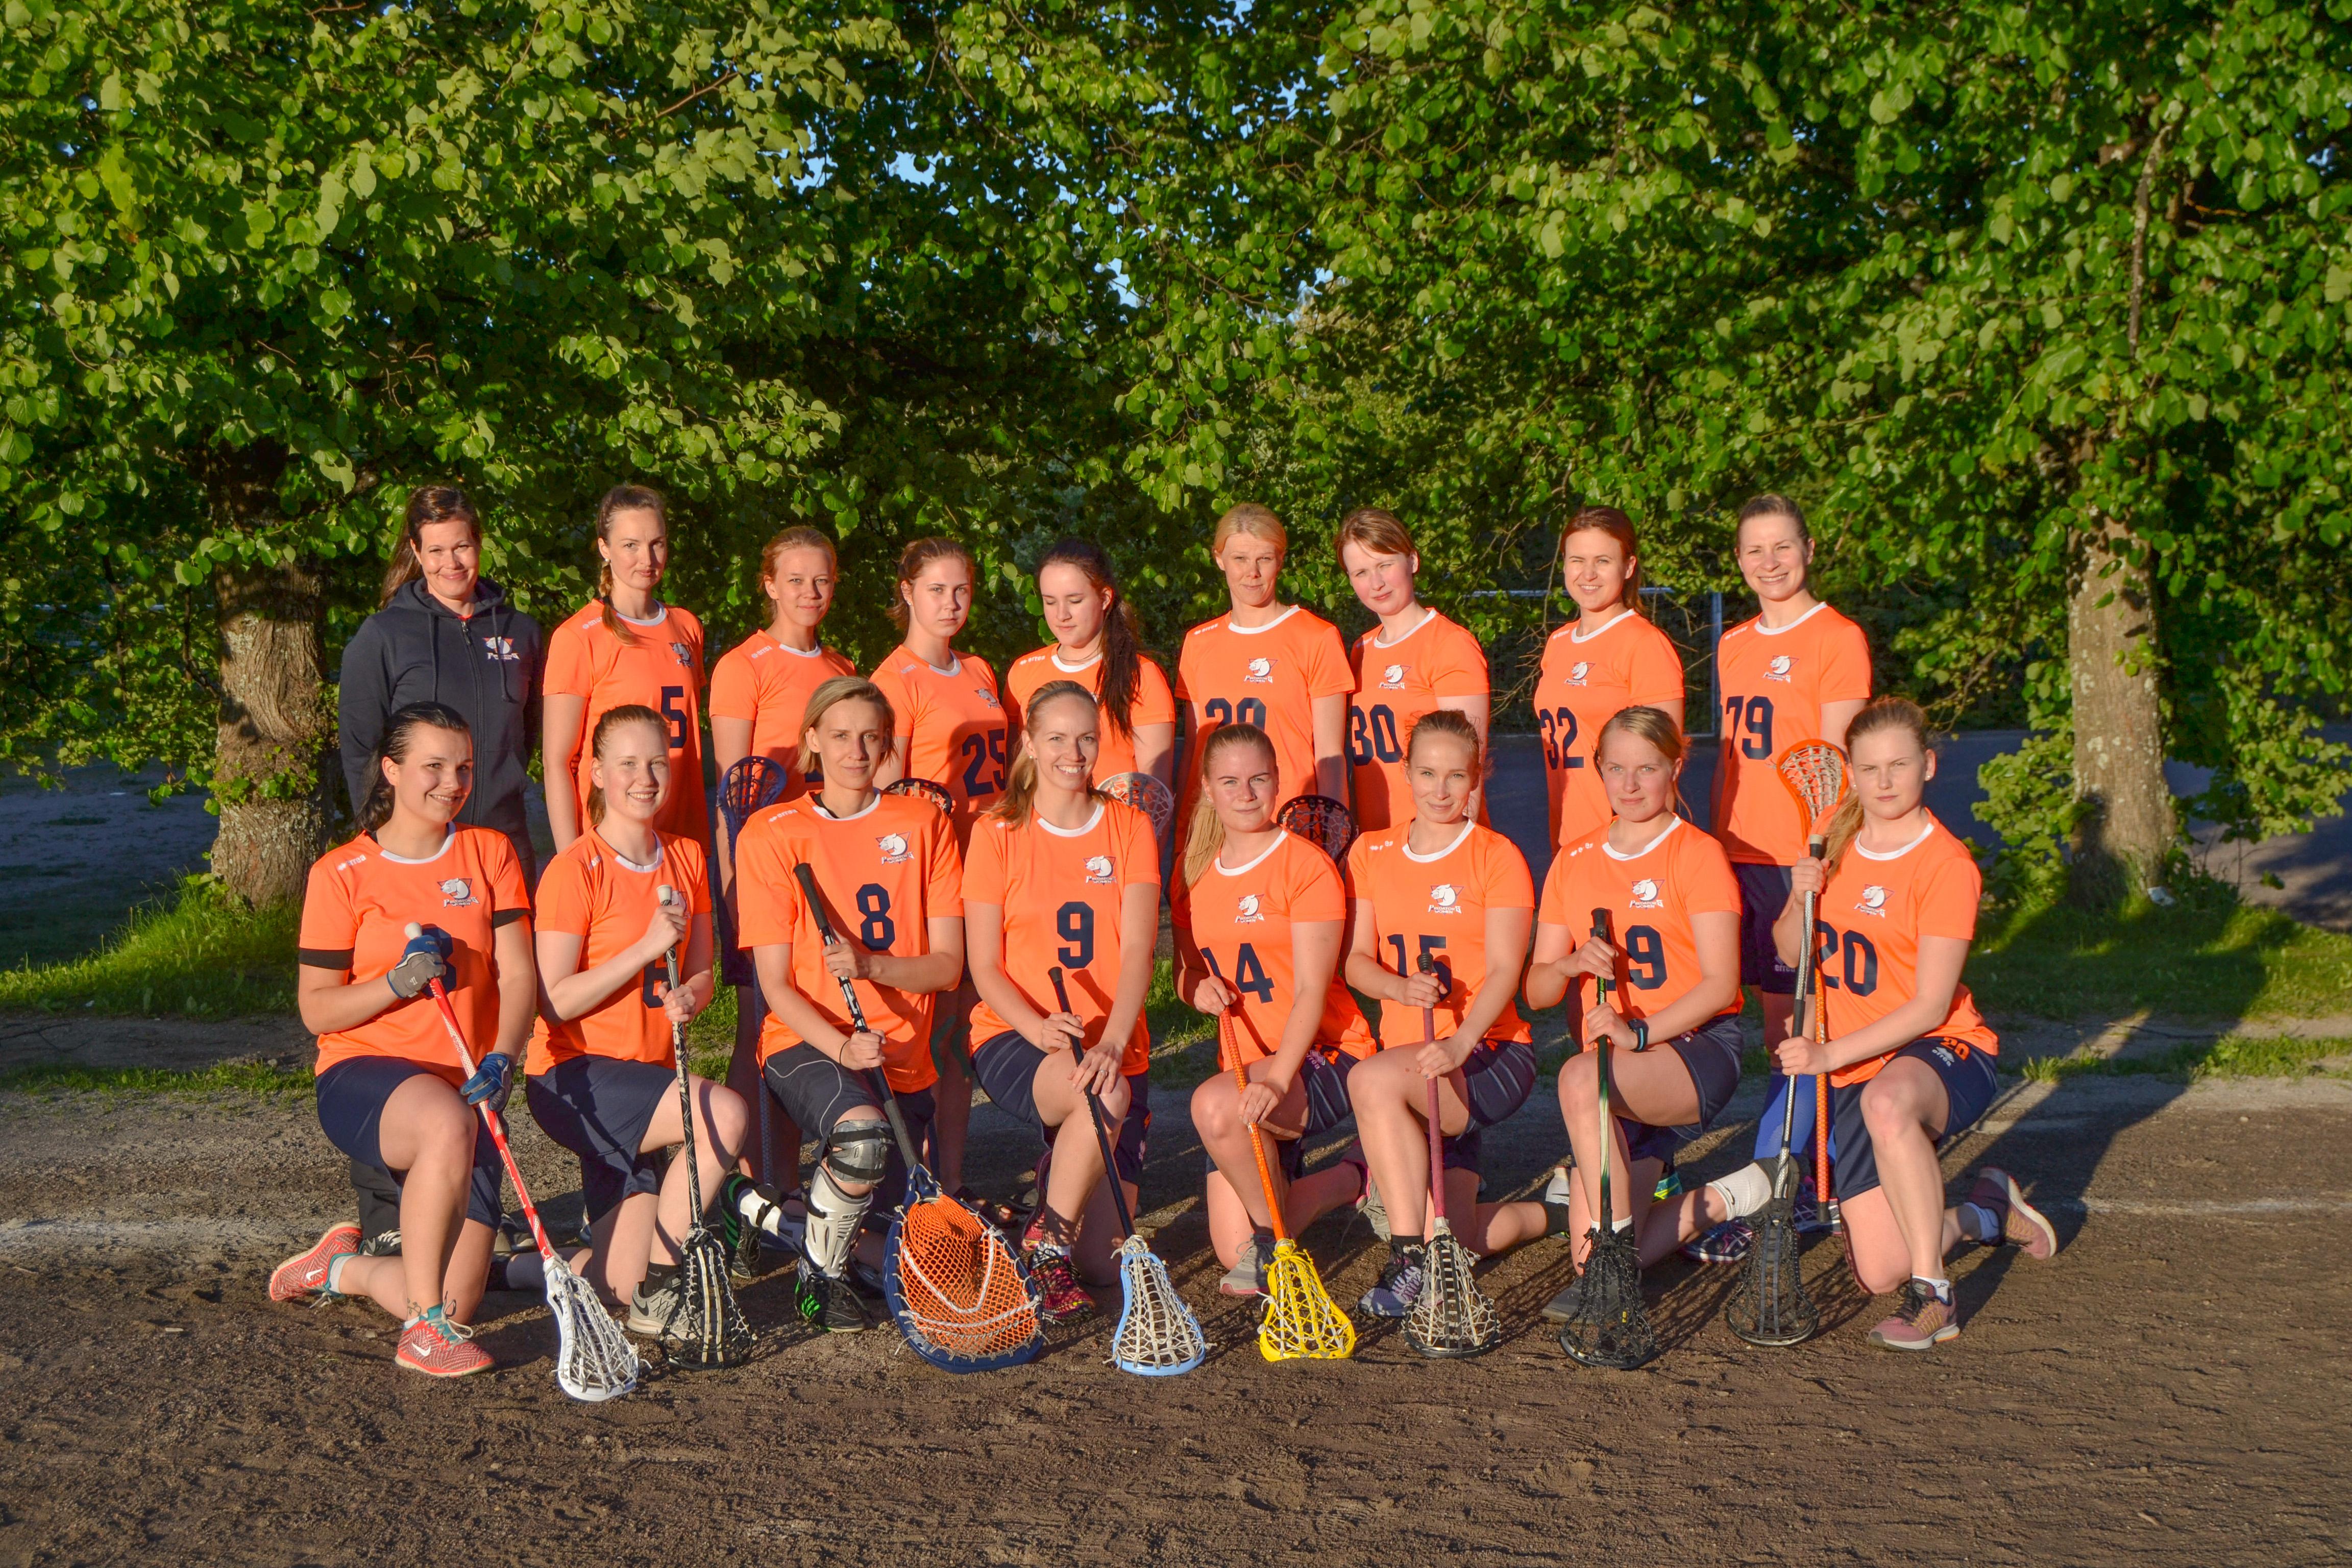 Naisten joukkue 2016 Predators Women